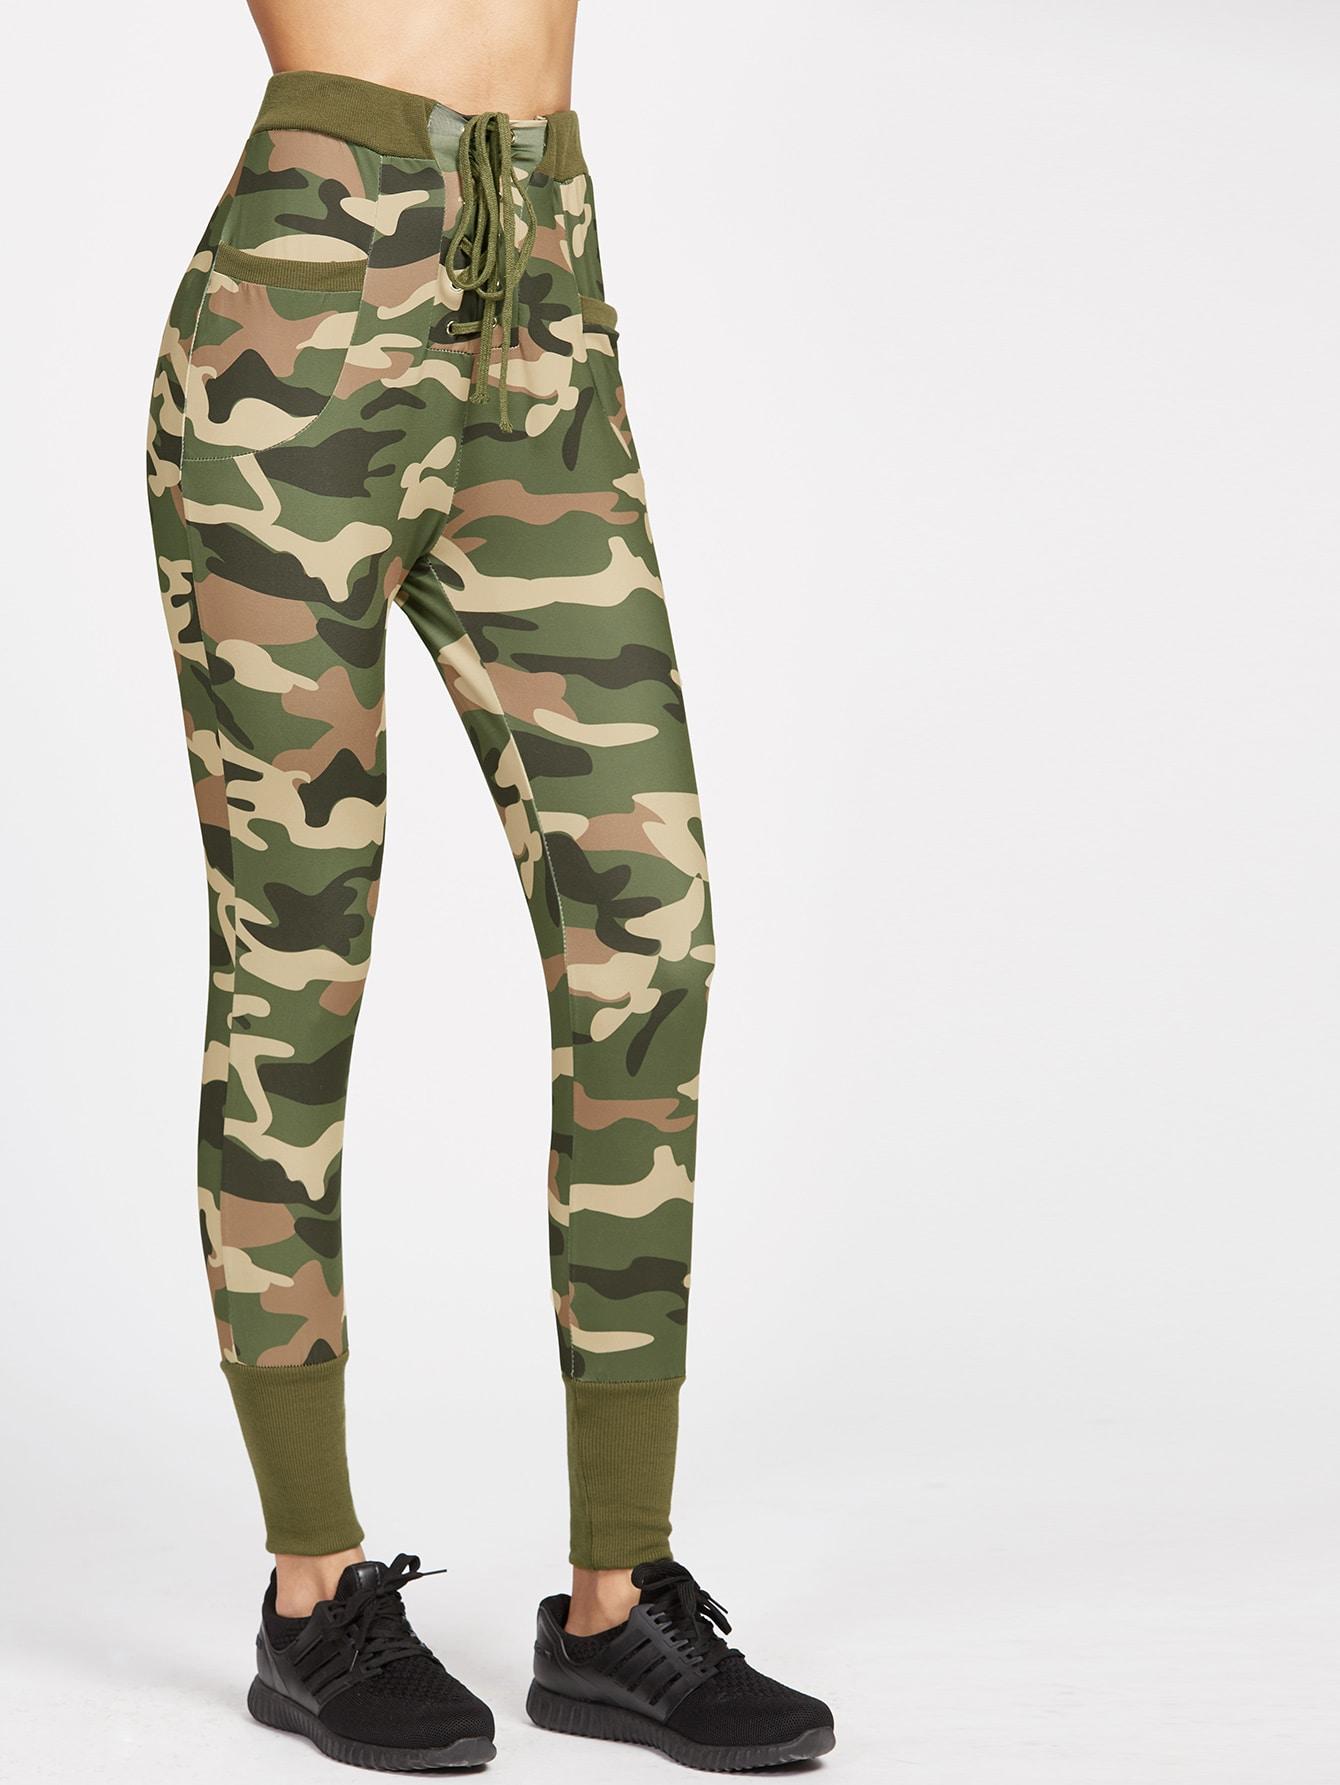 Camo Print Ribbed Trim Lace Up Skinny Pants pants170405301